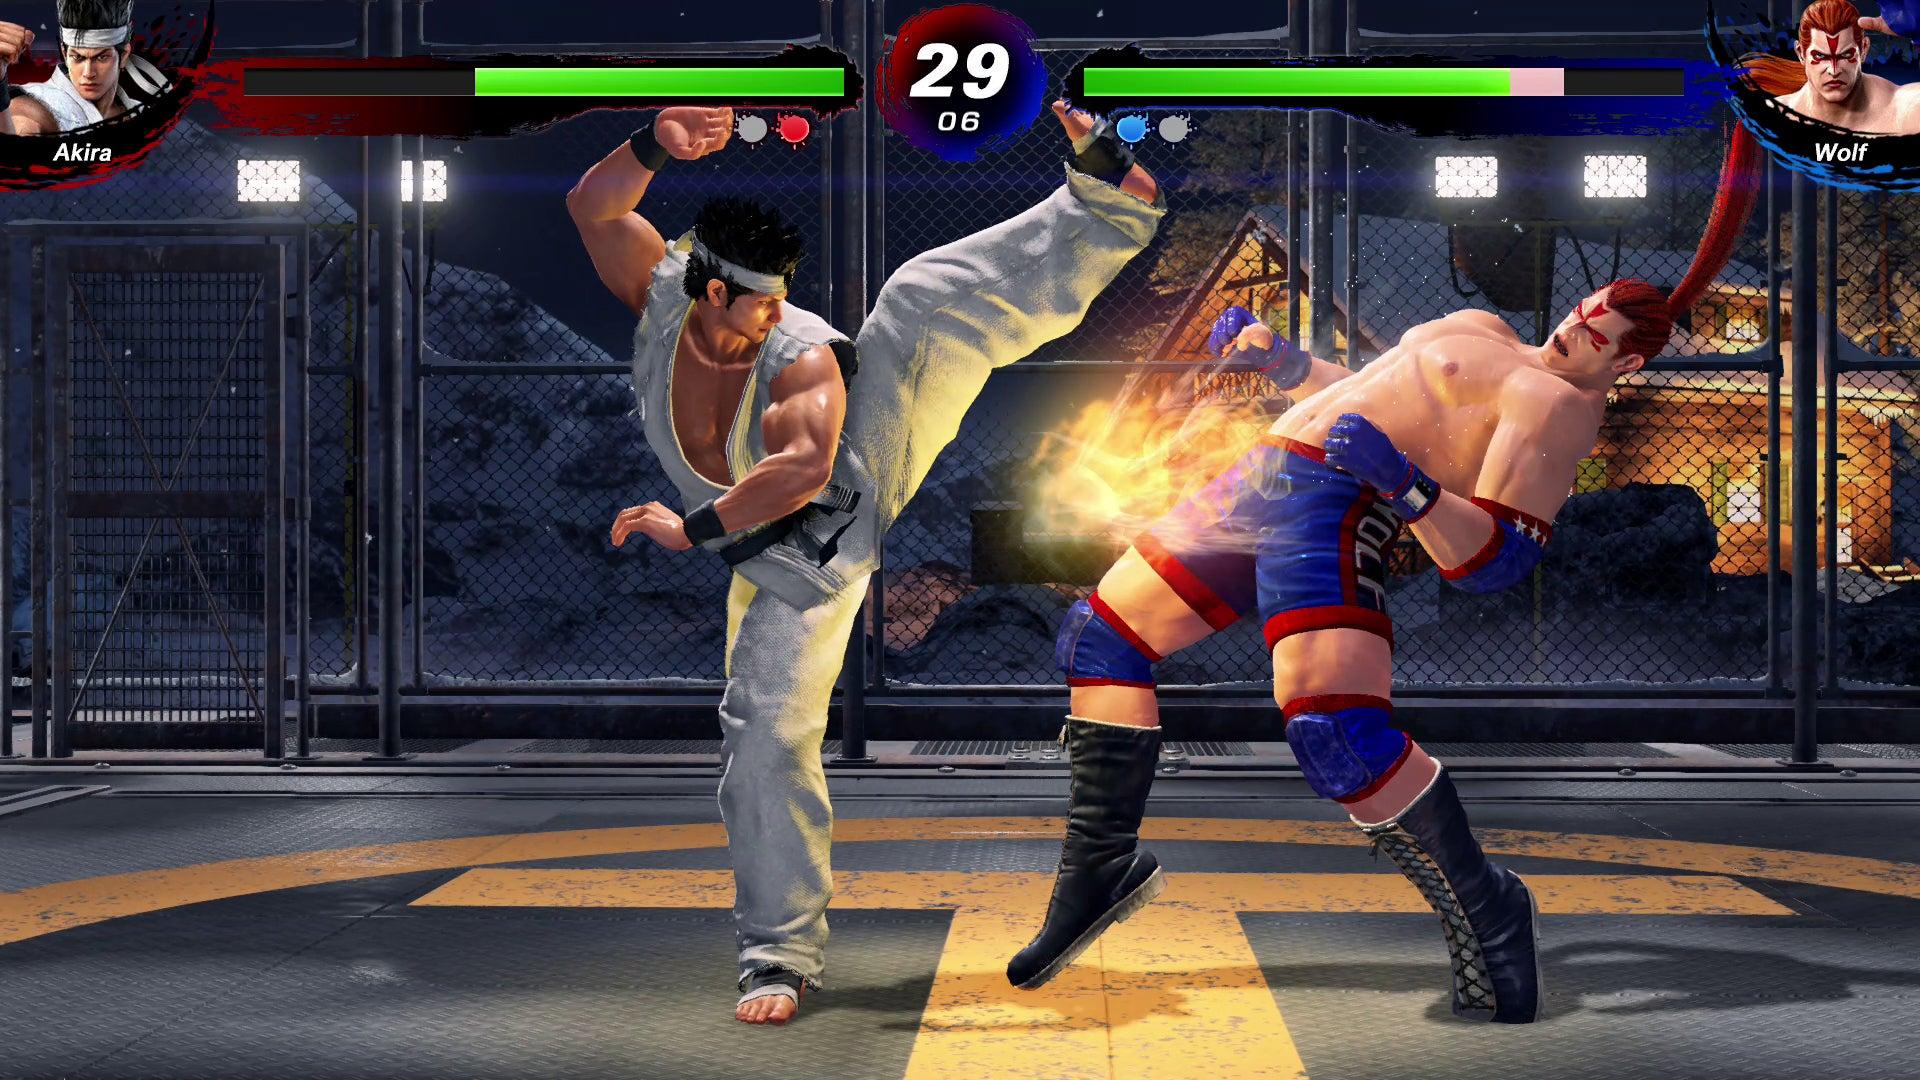 Virtua Fighter 5 Ultimate Showdown coming to PS4